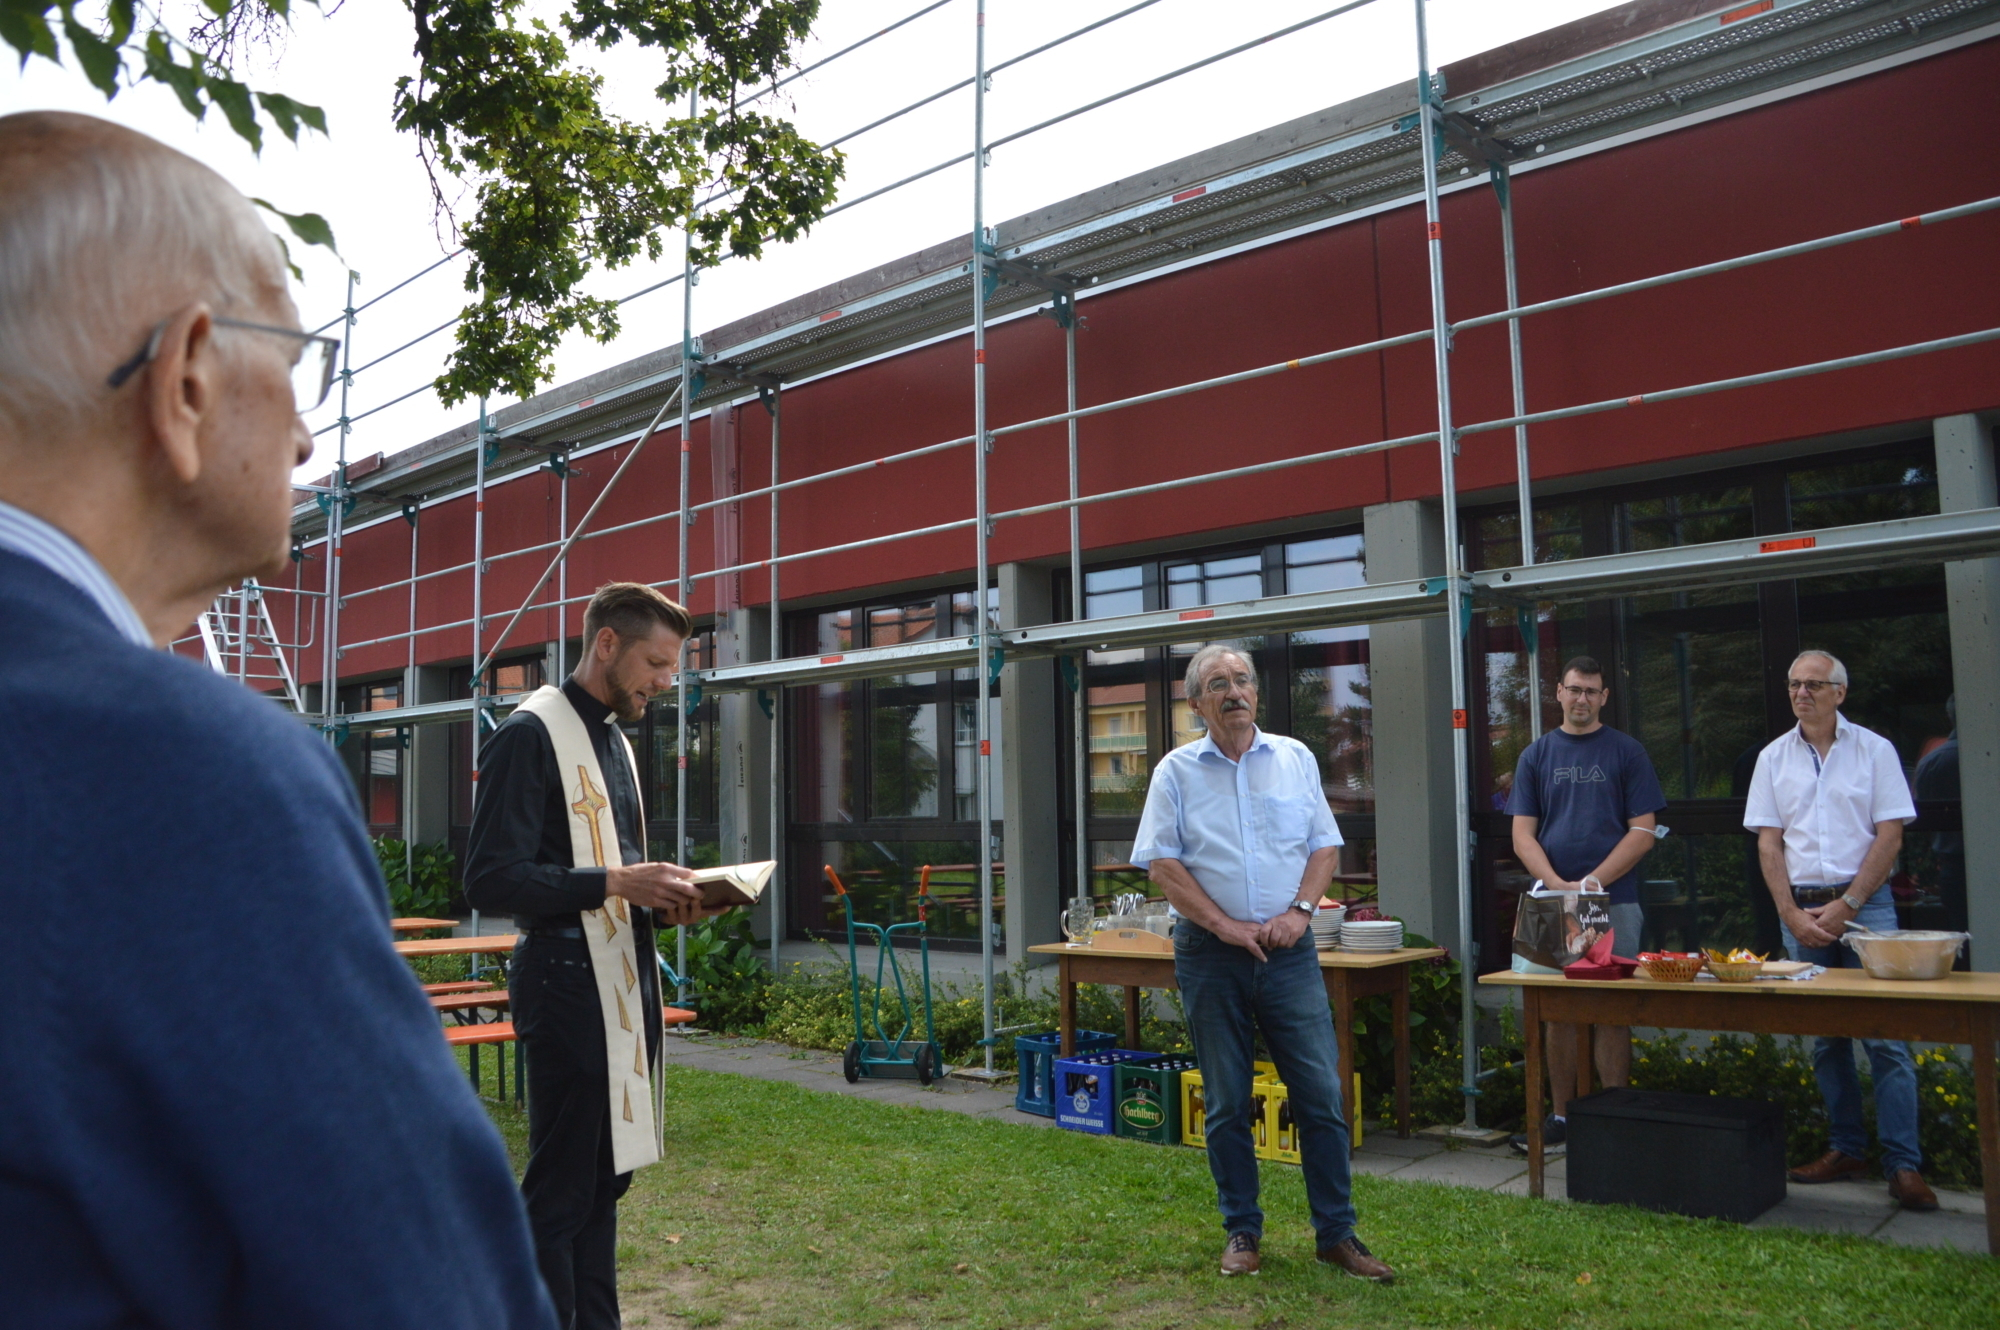 2021-09-10#Einweihung_Pultdach_St-Johannes_DSC_0003.jpg